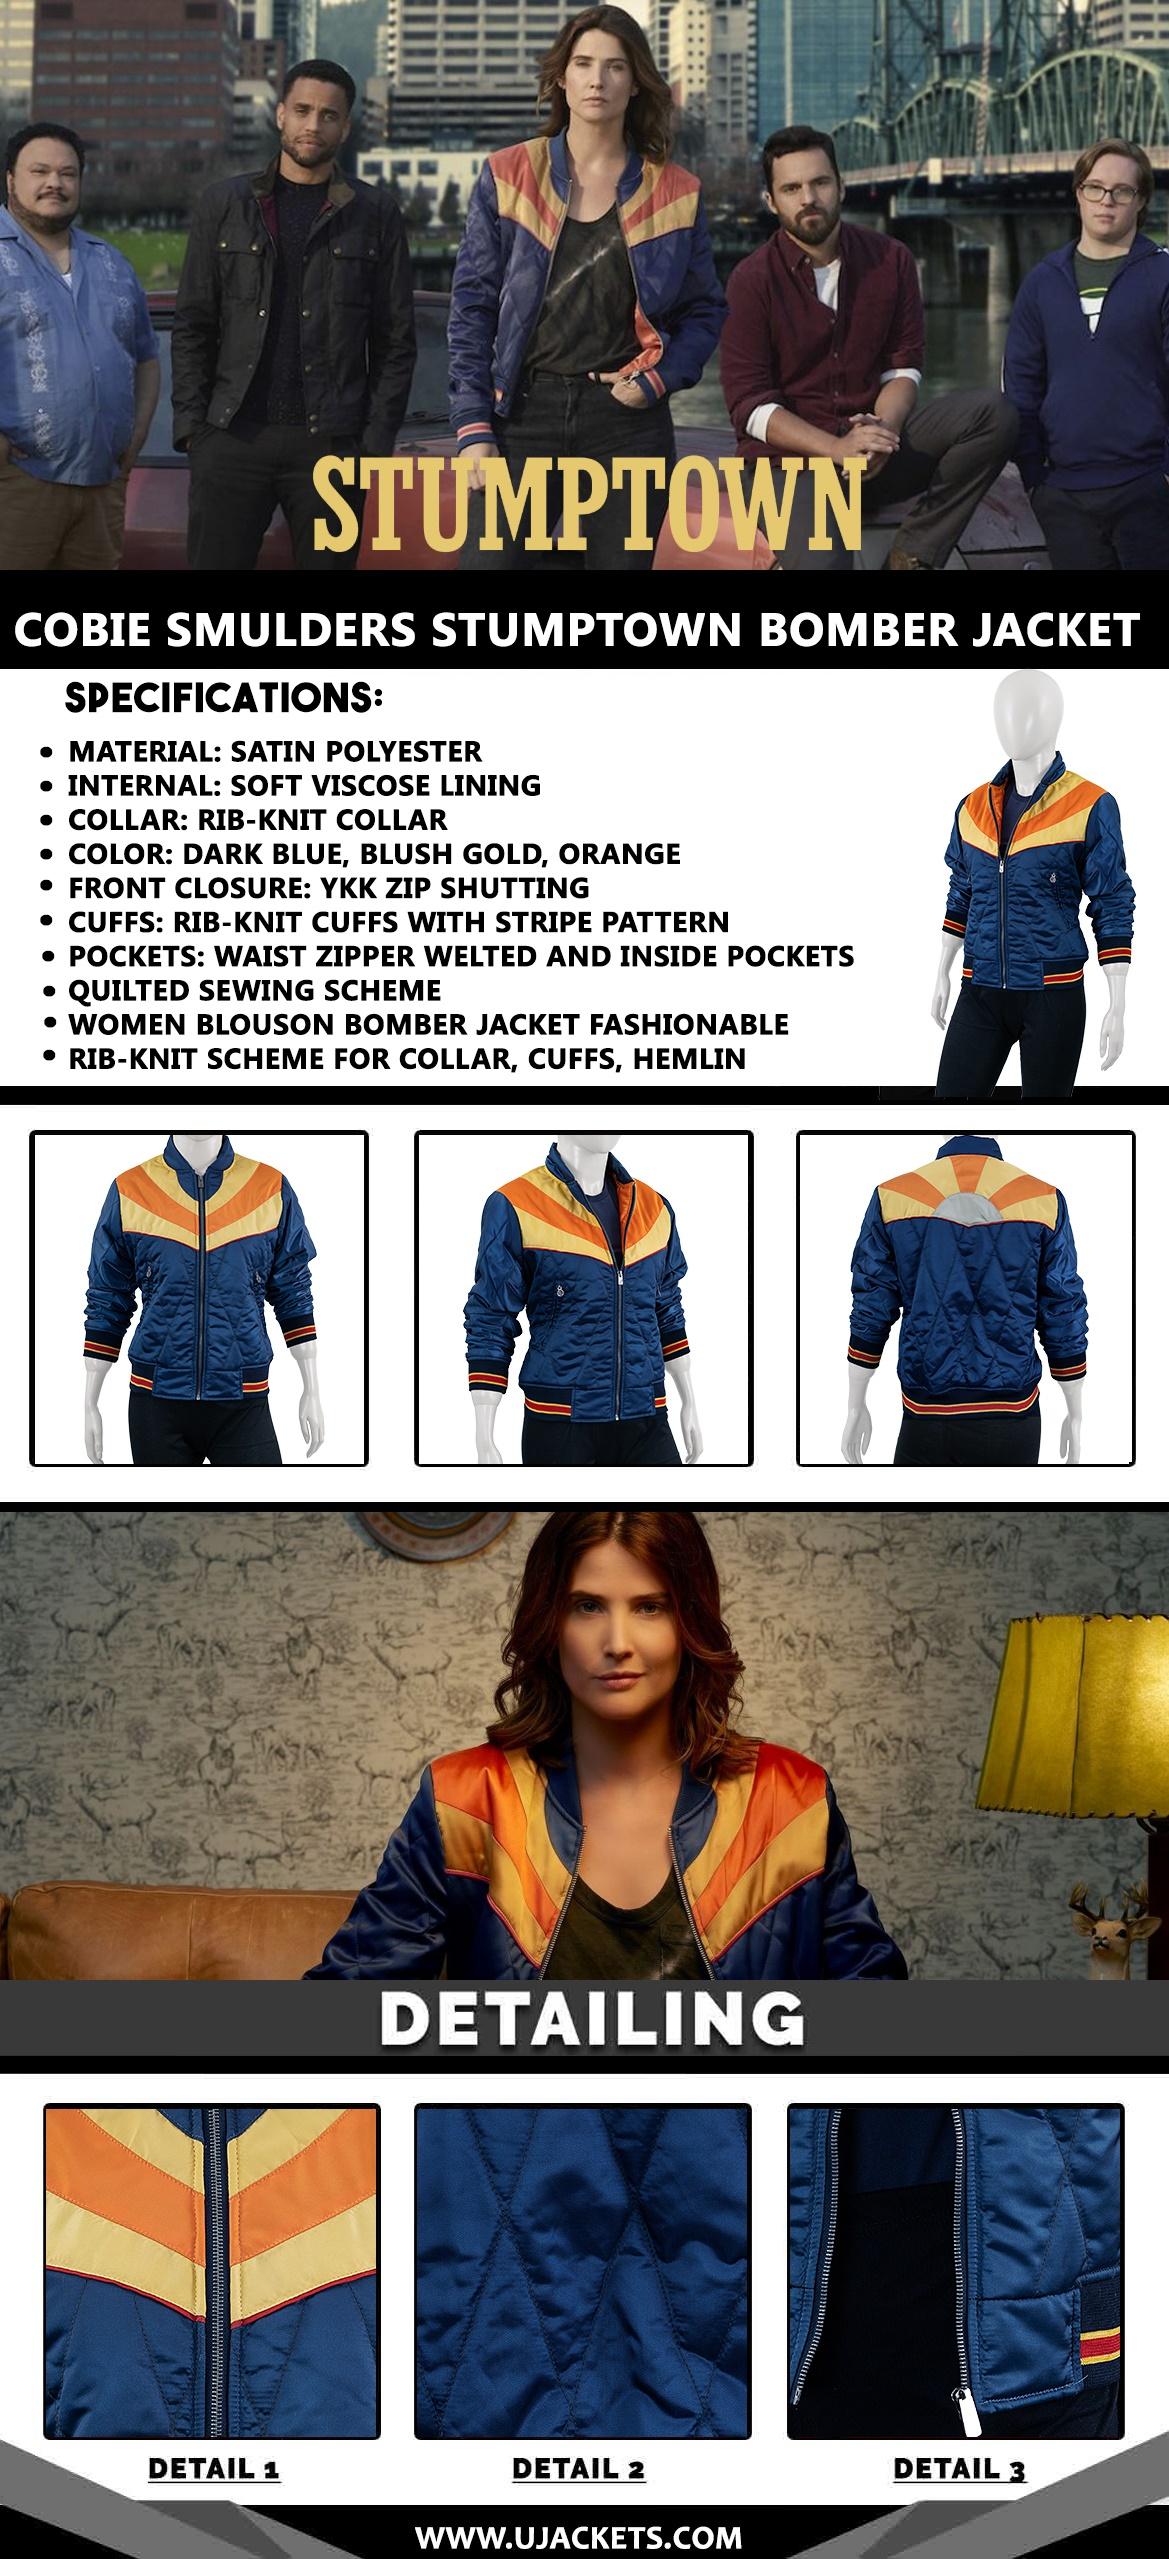 Cobie-Smulders-Stumptown-Bomber-Jacket (1)